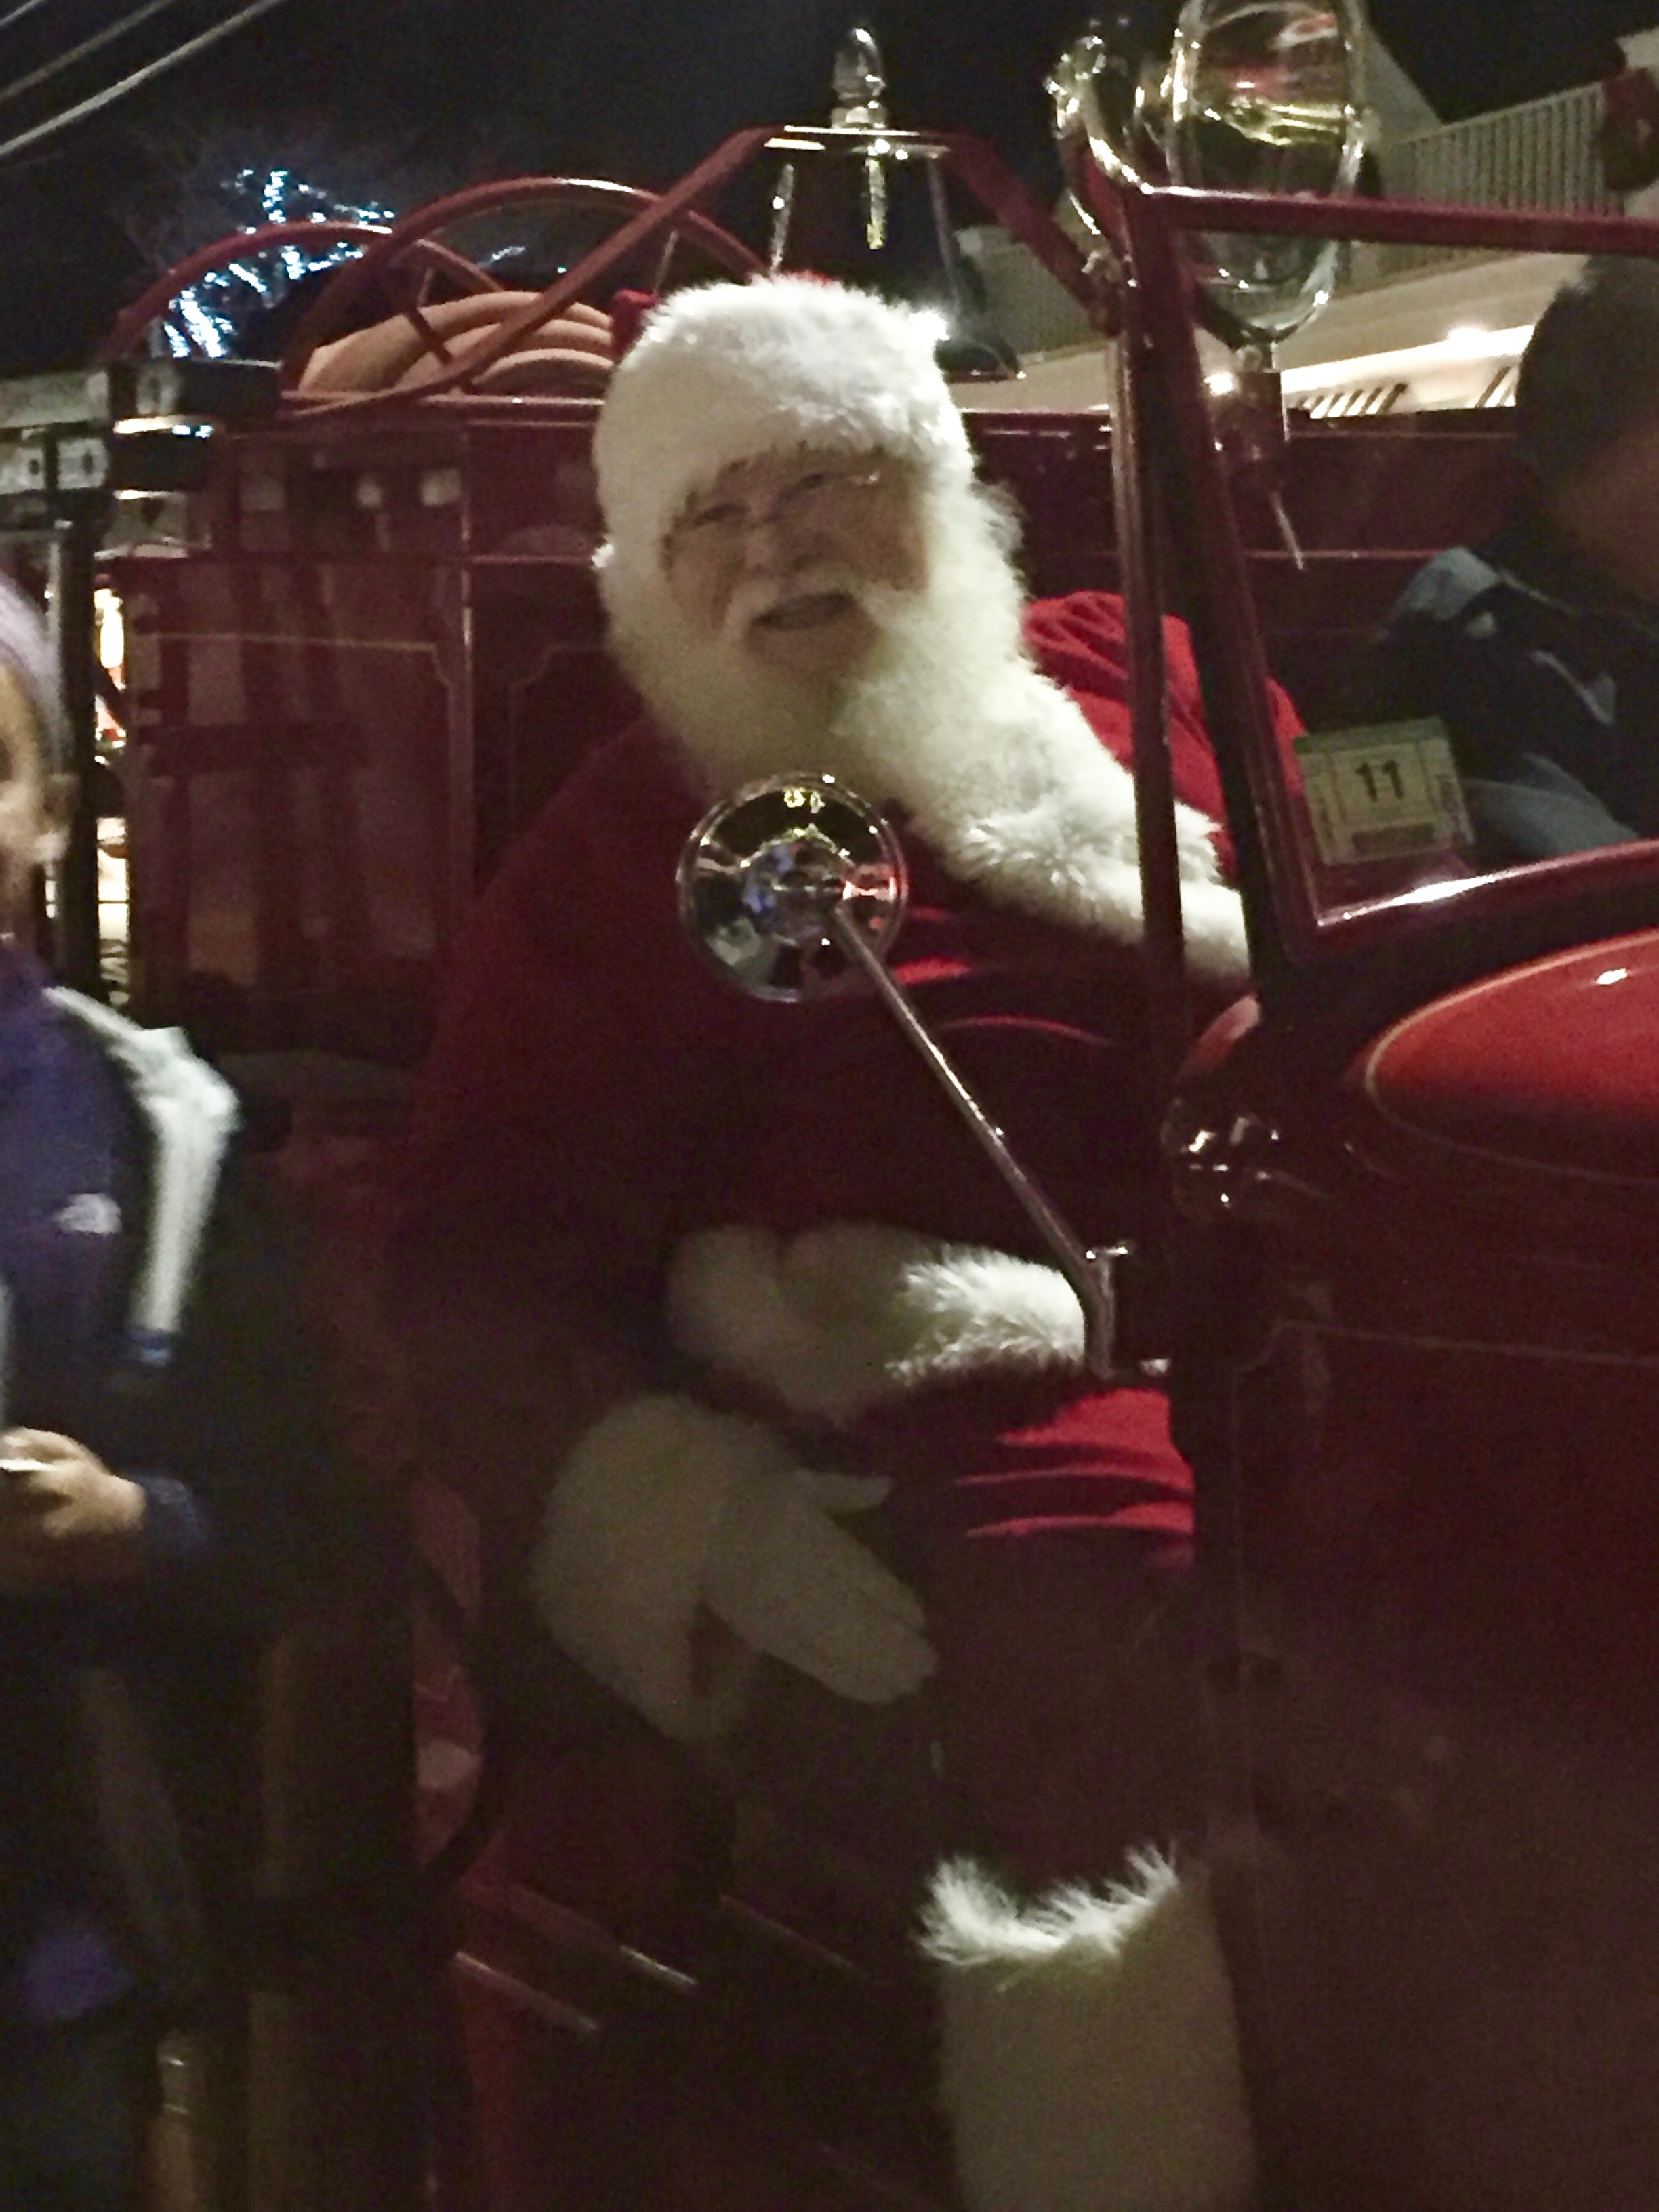 We even got a quick glimpse of Santa Claus!